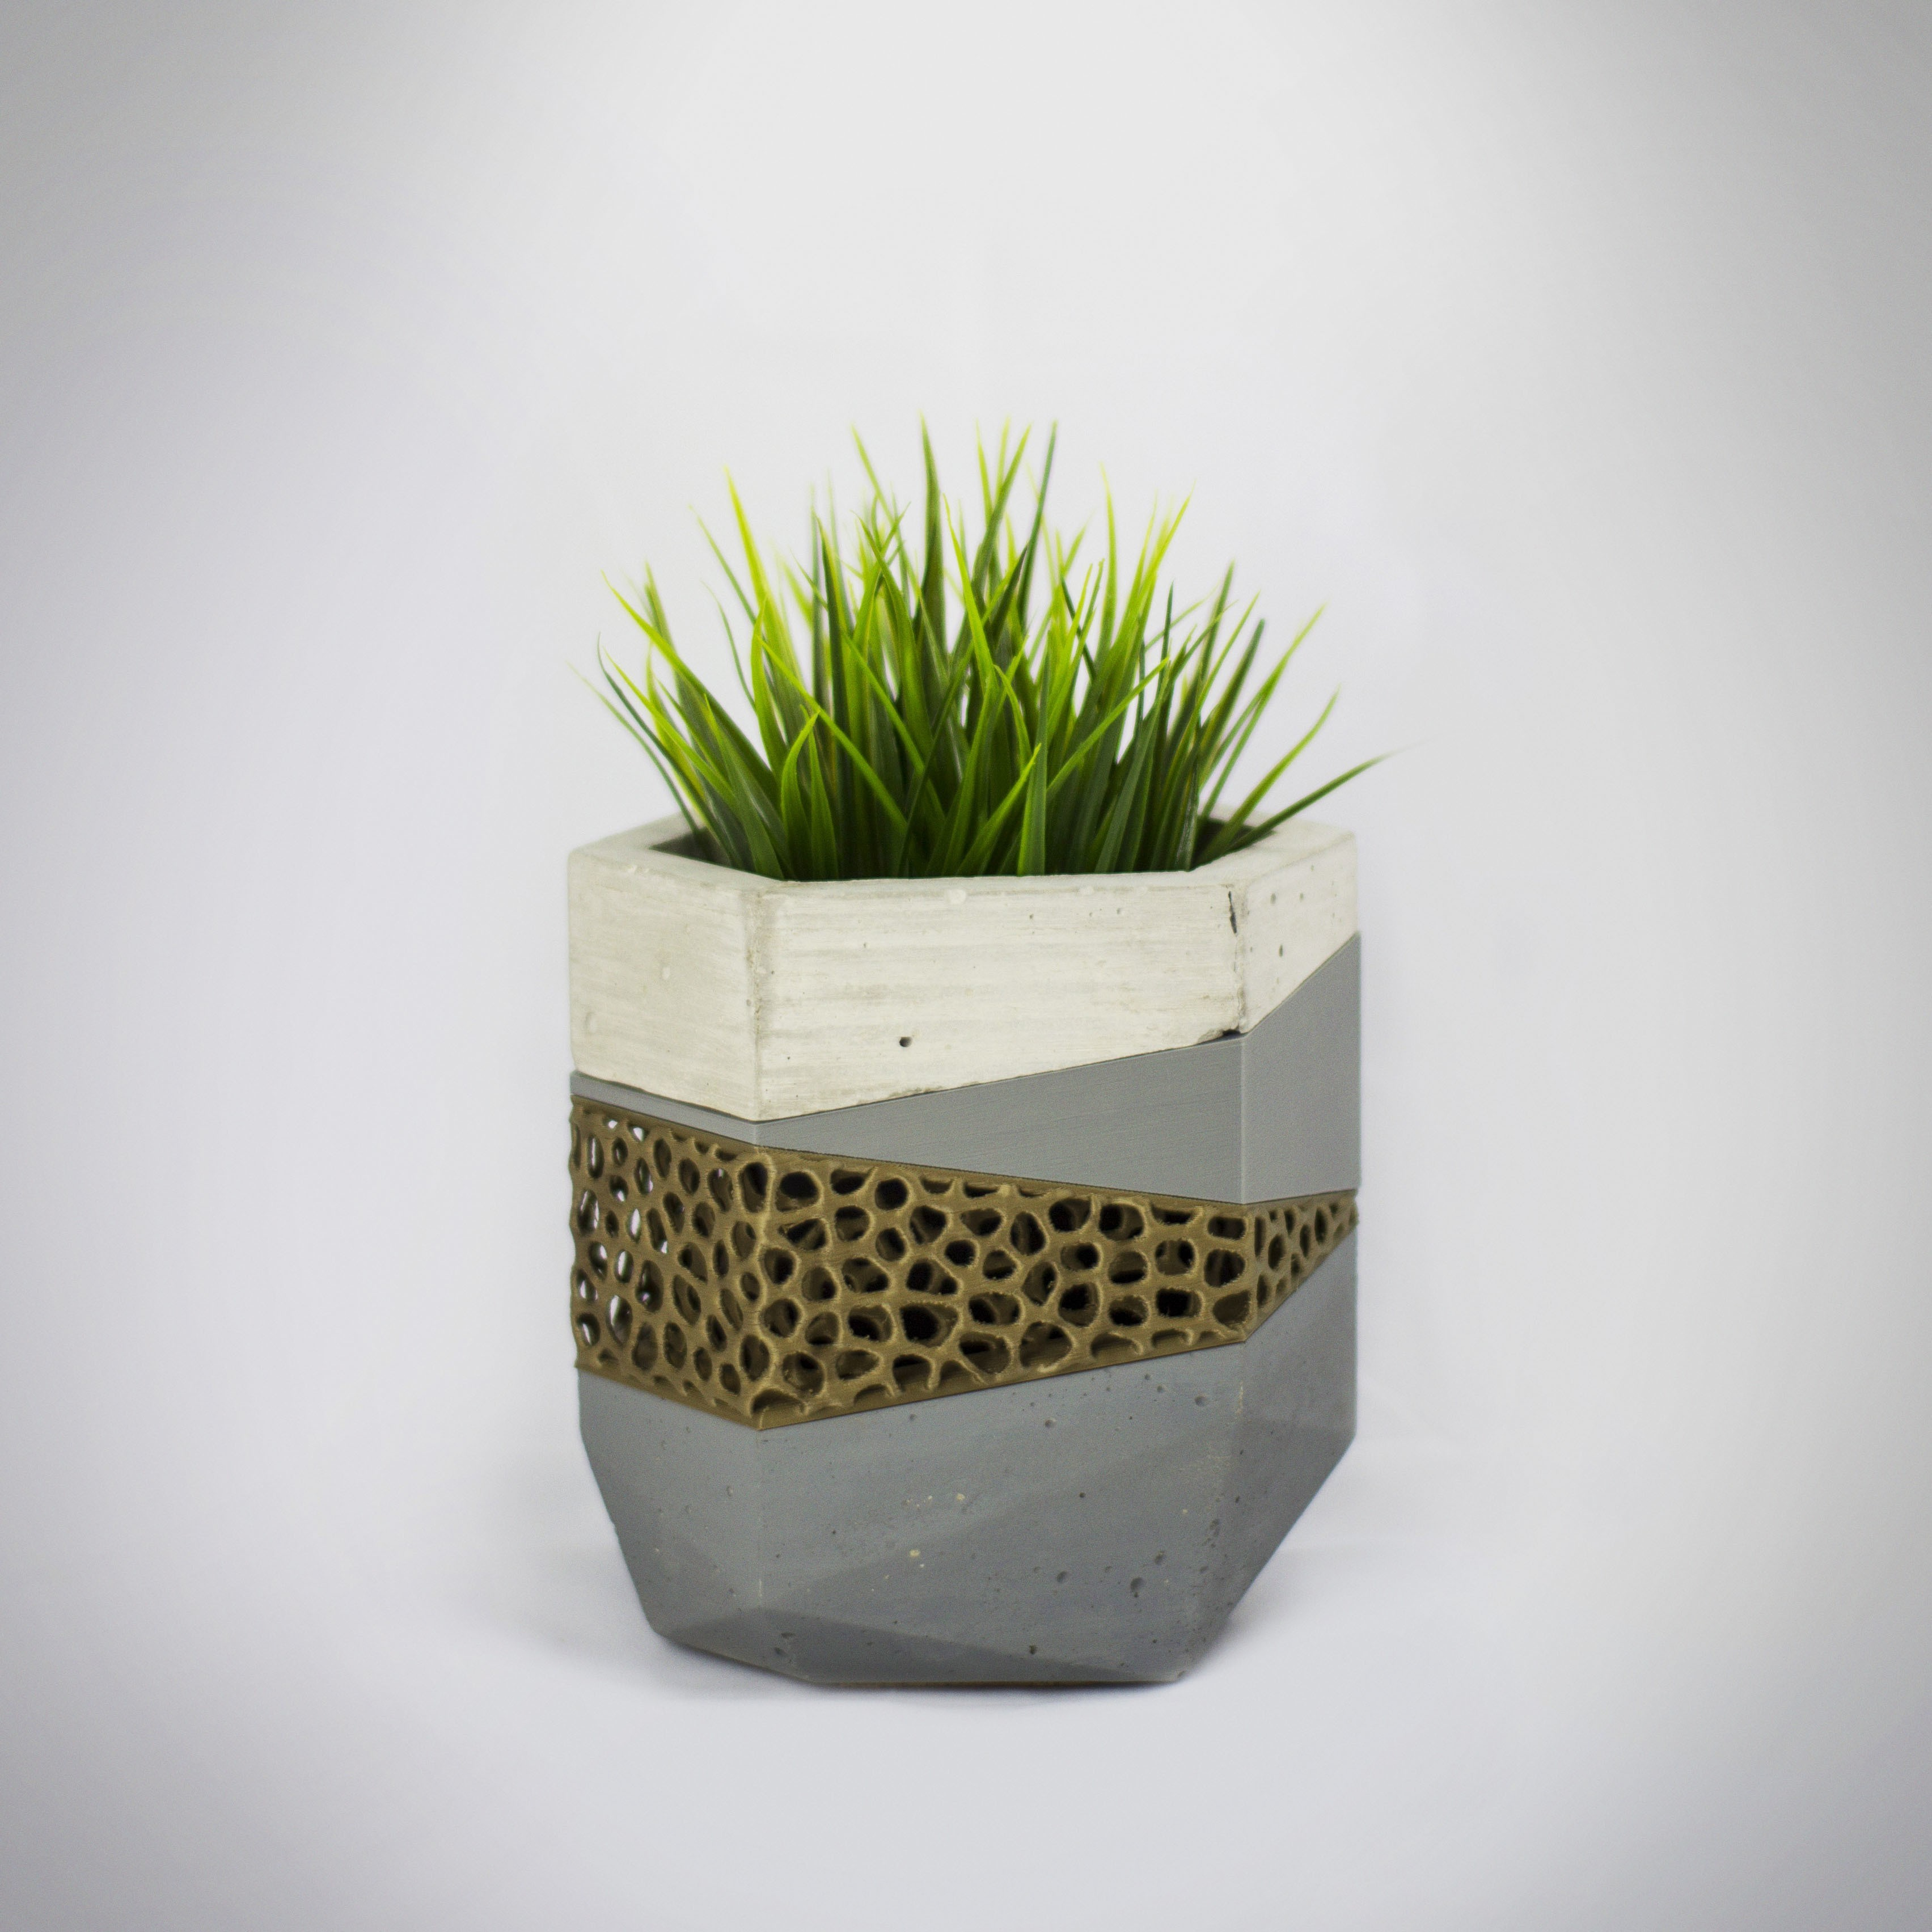 Maceteros 4 insta.jpg Download free STL file Concrete Planters Mold • 3D print model, dukedoks